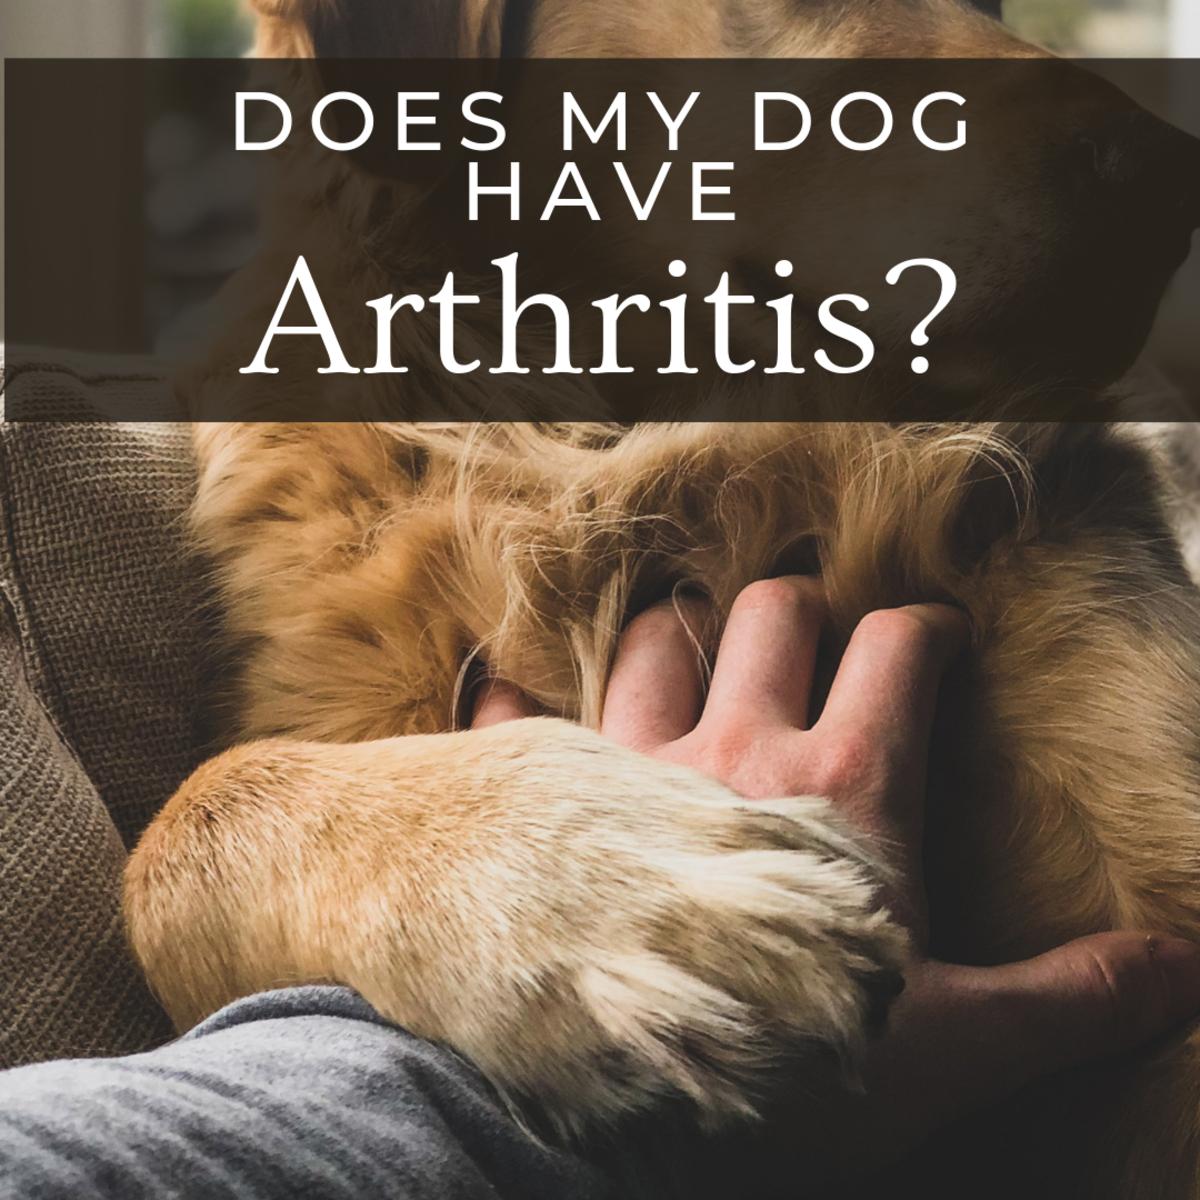 Does my dog have arthritis?